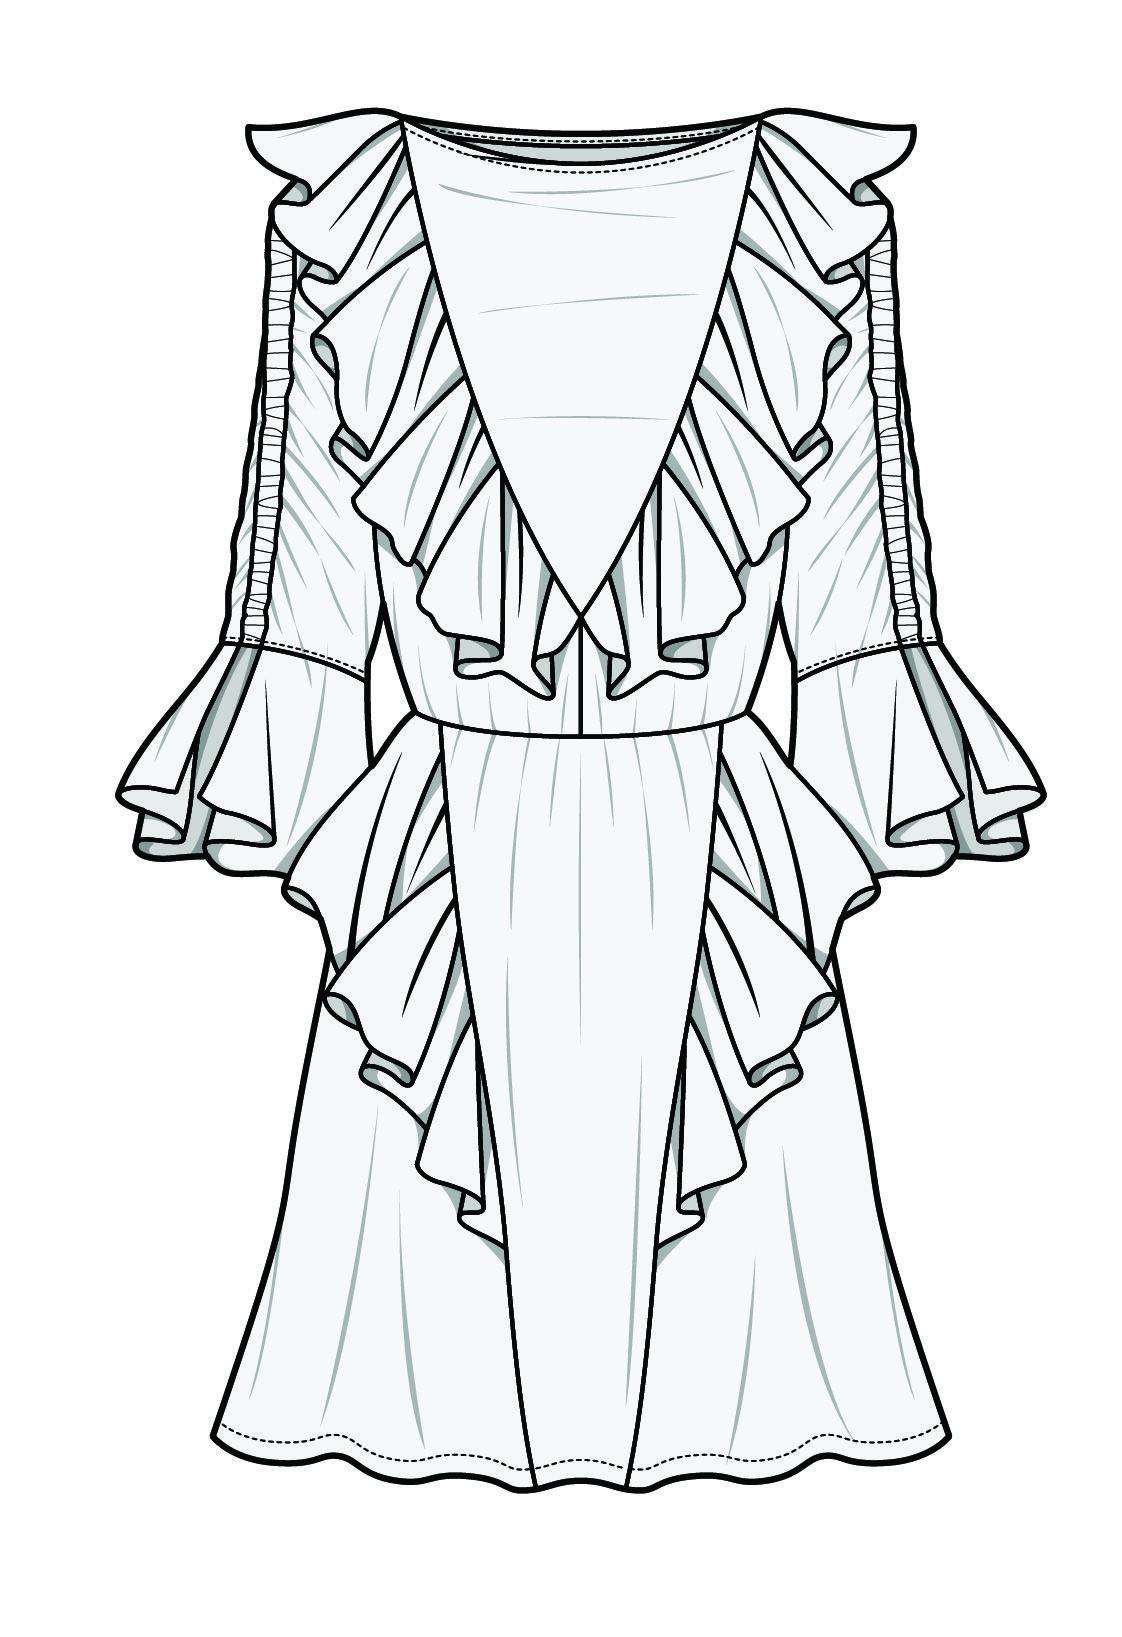 Bykym Drawing Dress Costume Pinterest Fashion Fashion